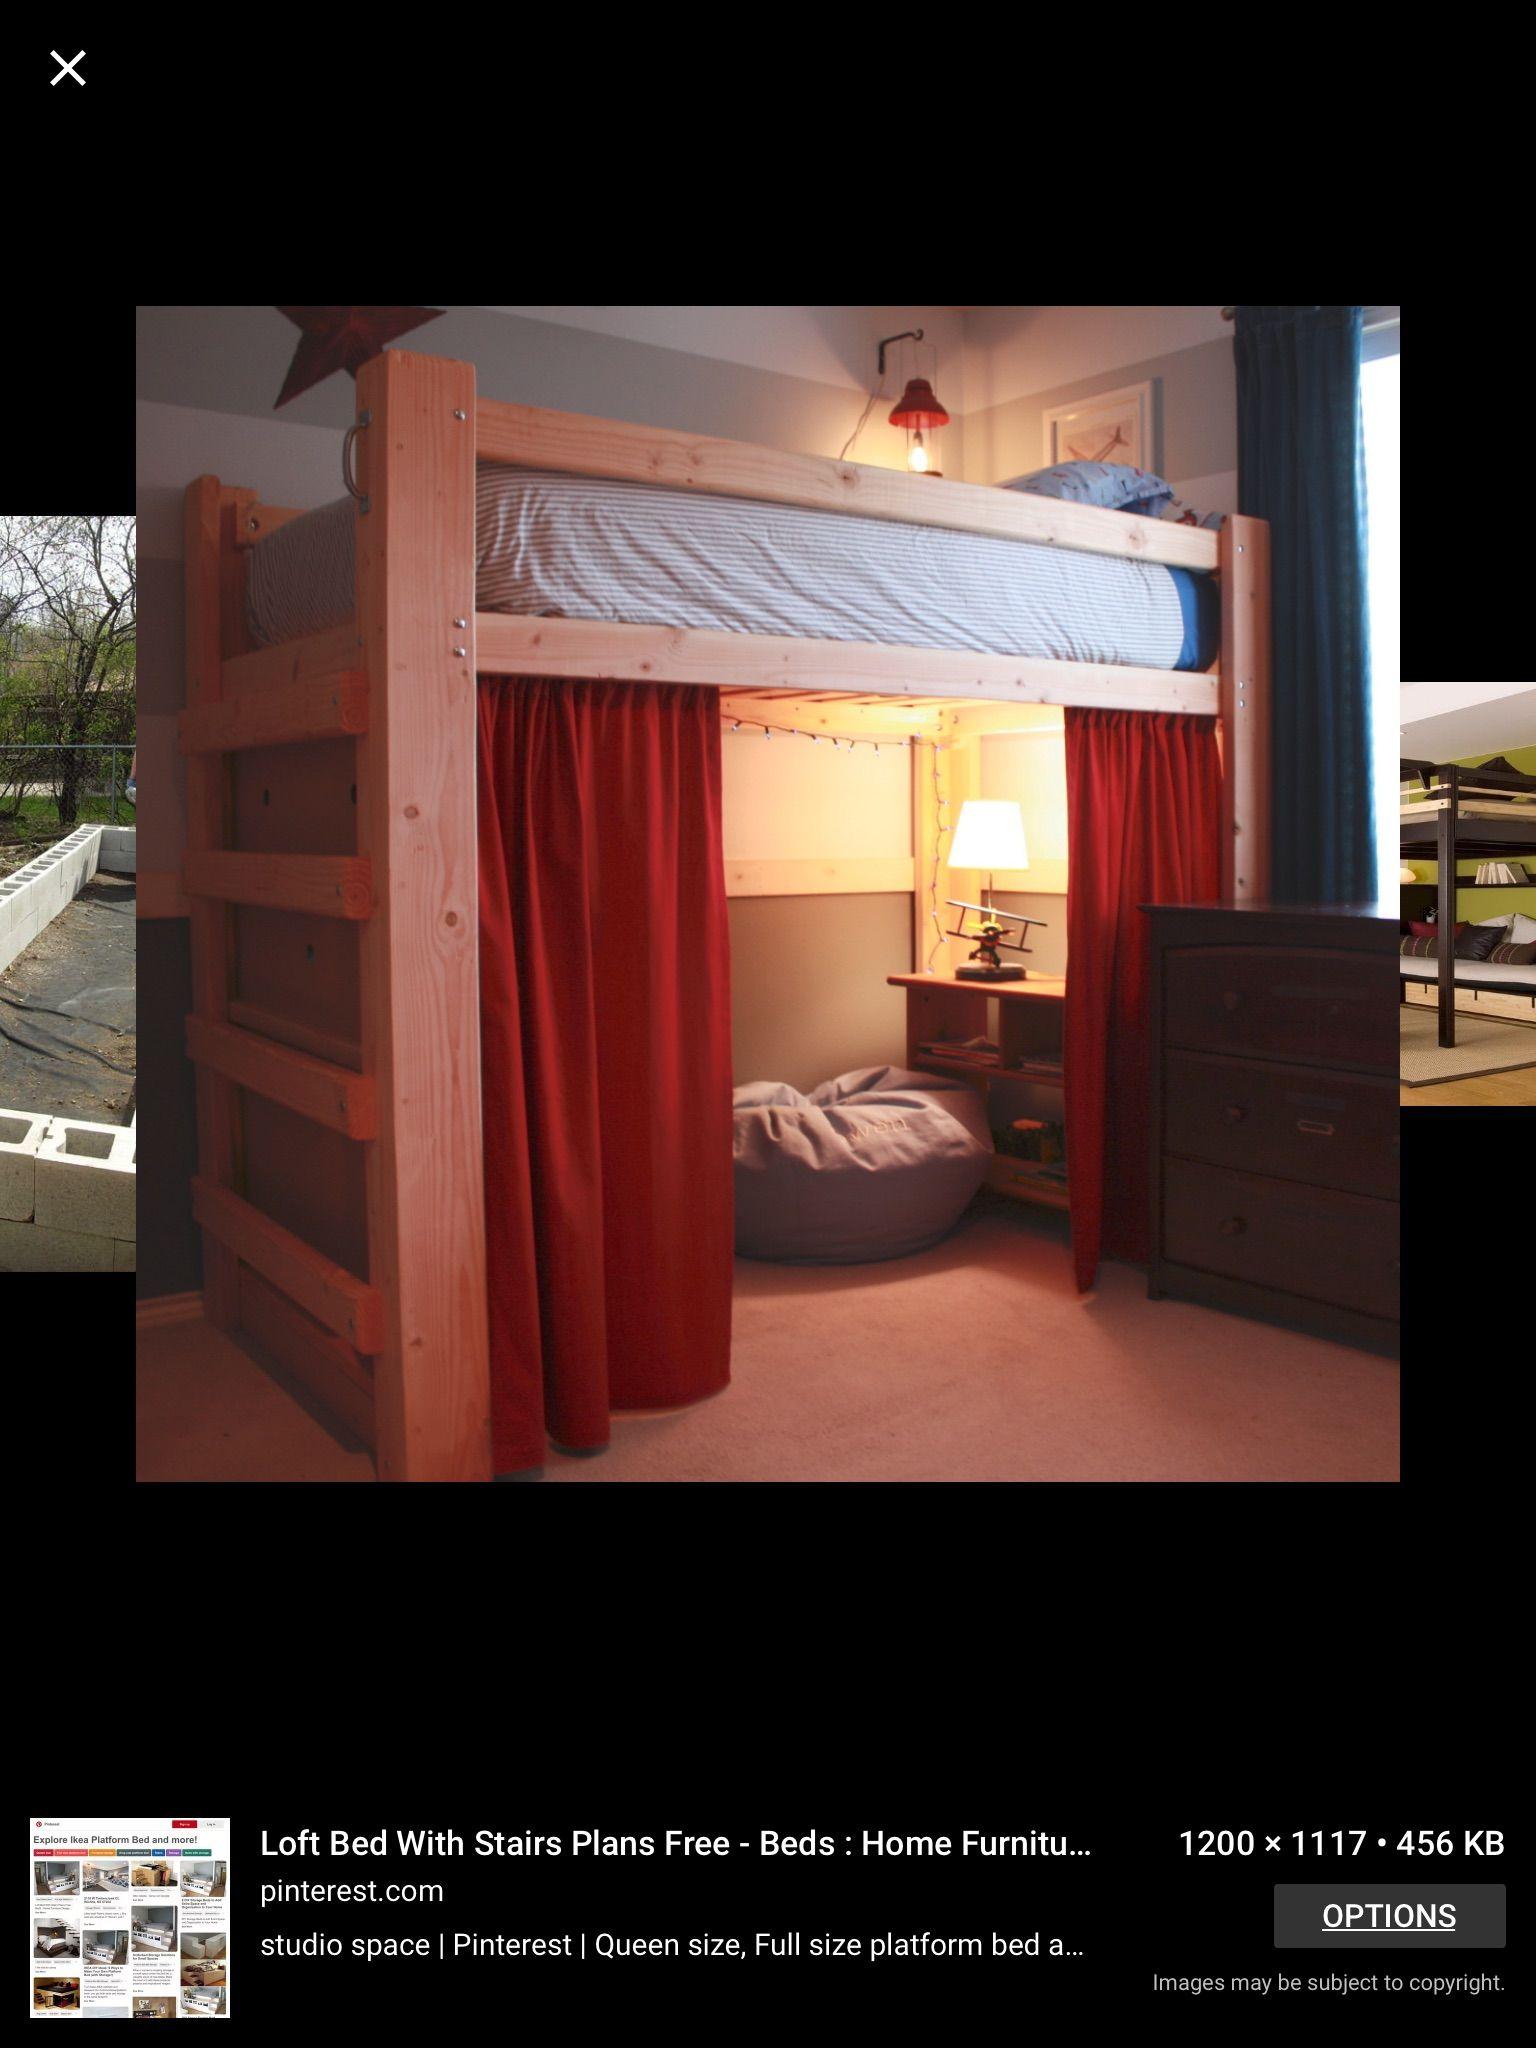 Loft bed ideas for dorm room  Pin by Christina Ruiz on Home Ideas  Pinterest